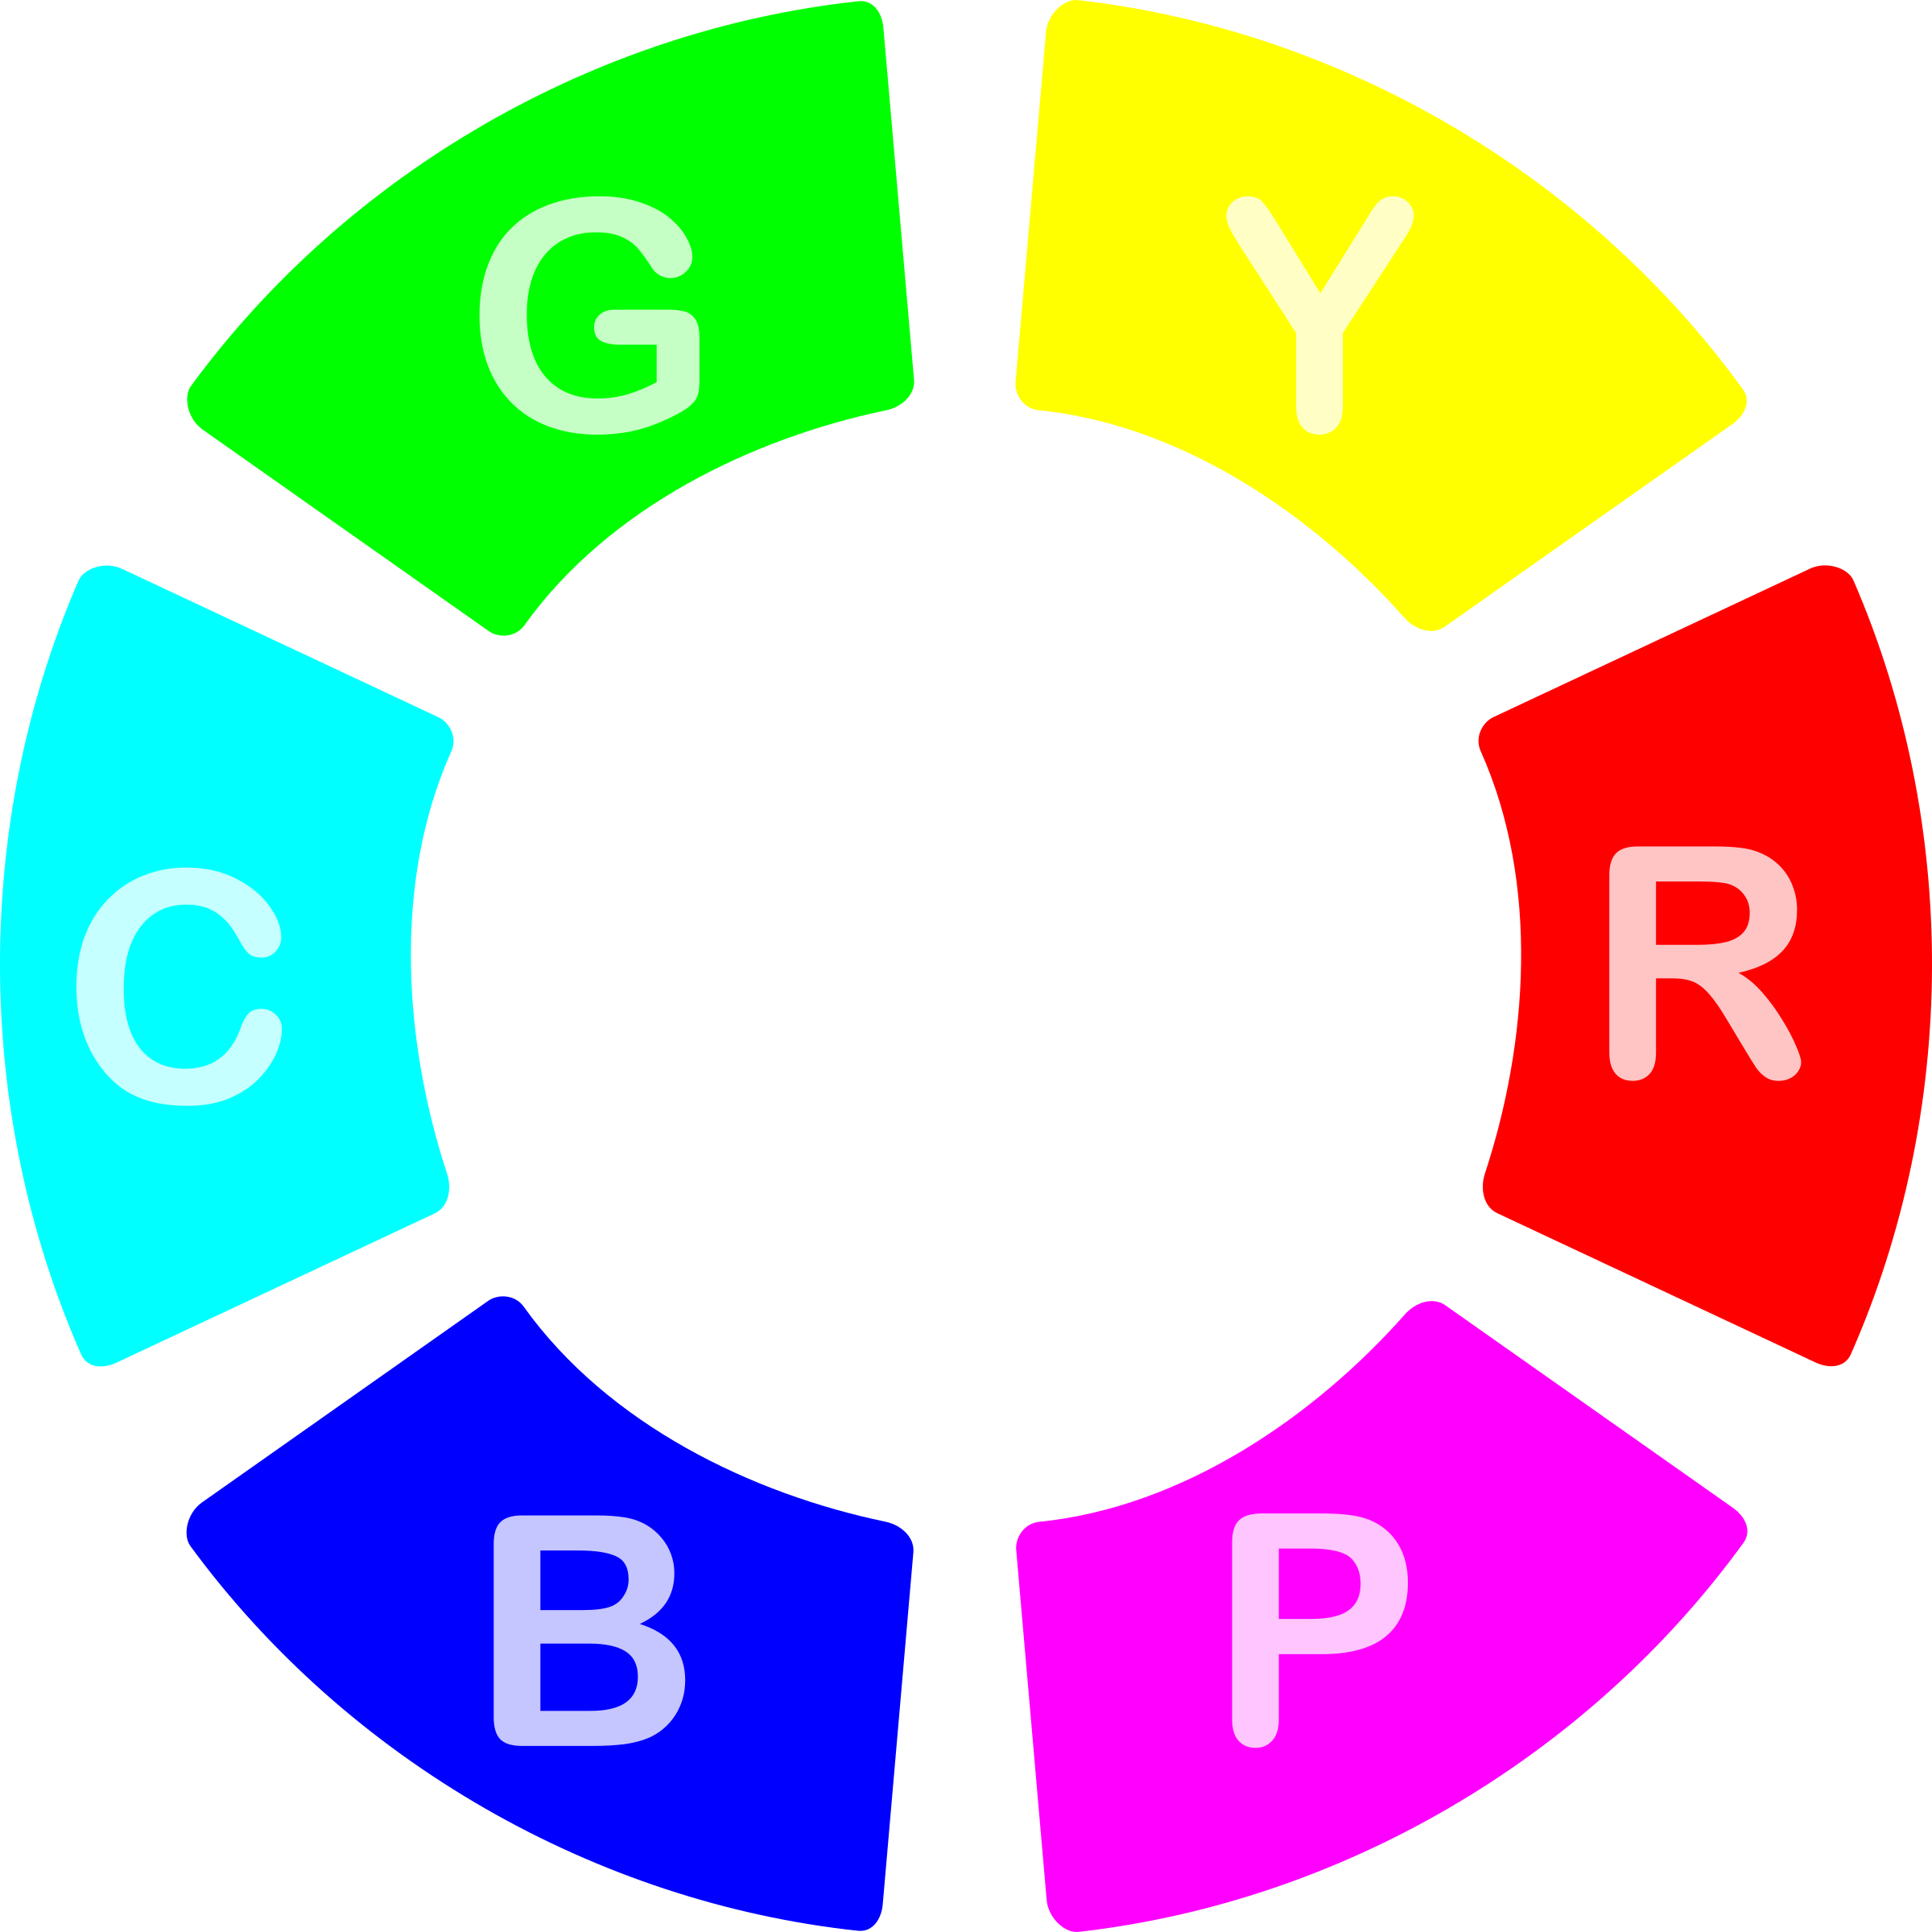 Color big image png. Wheel clipart circle thing